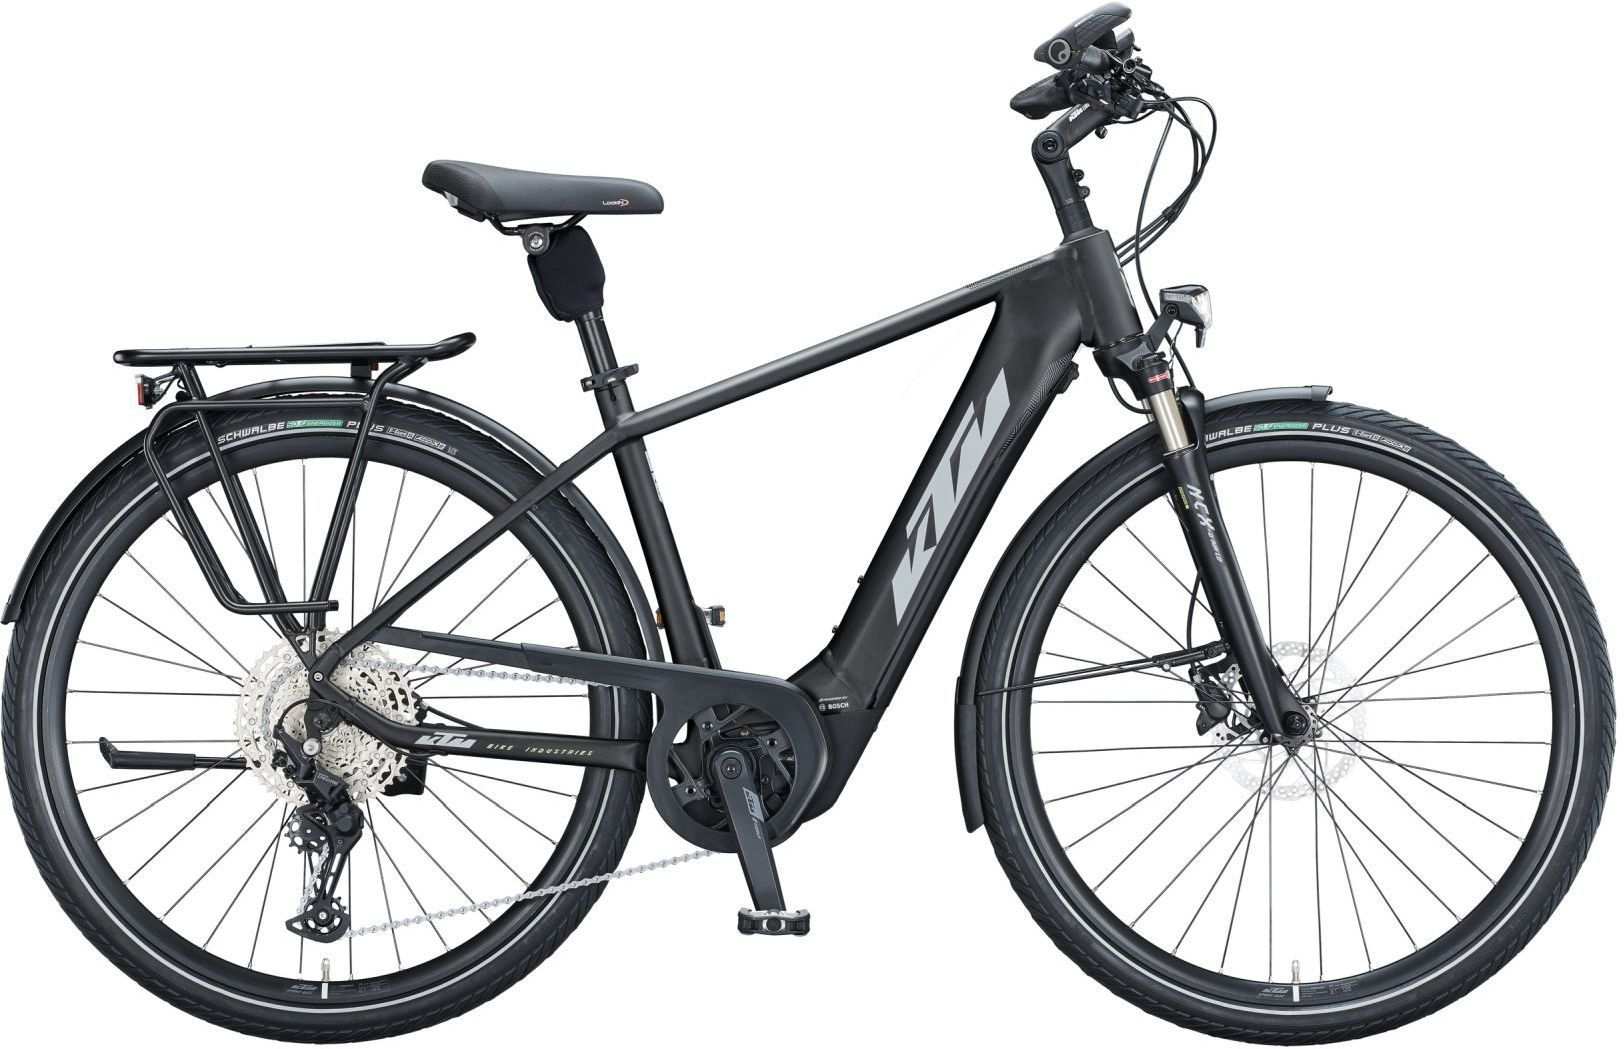 E-Bikes: KTM  CENTO 11 PLUS (625 Wh) 11 Gang Kettenschaltung Herrenfahrrad Diamant Modell 2021 29 Zoll 51 cm